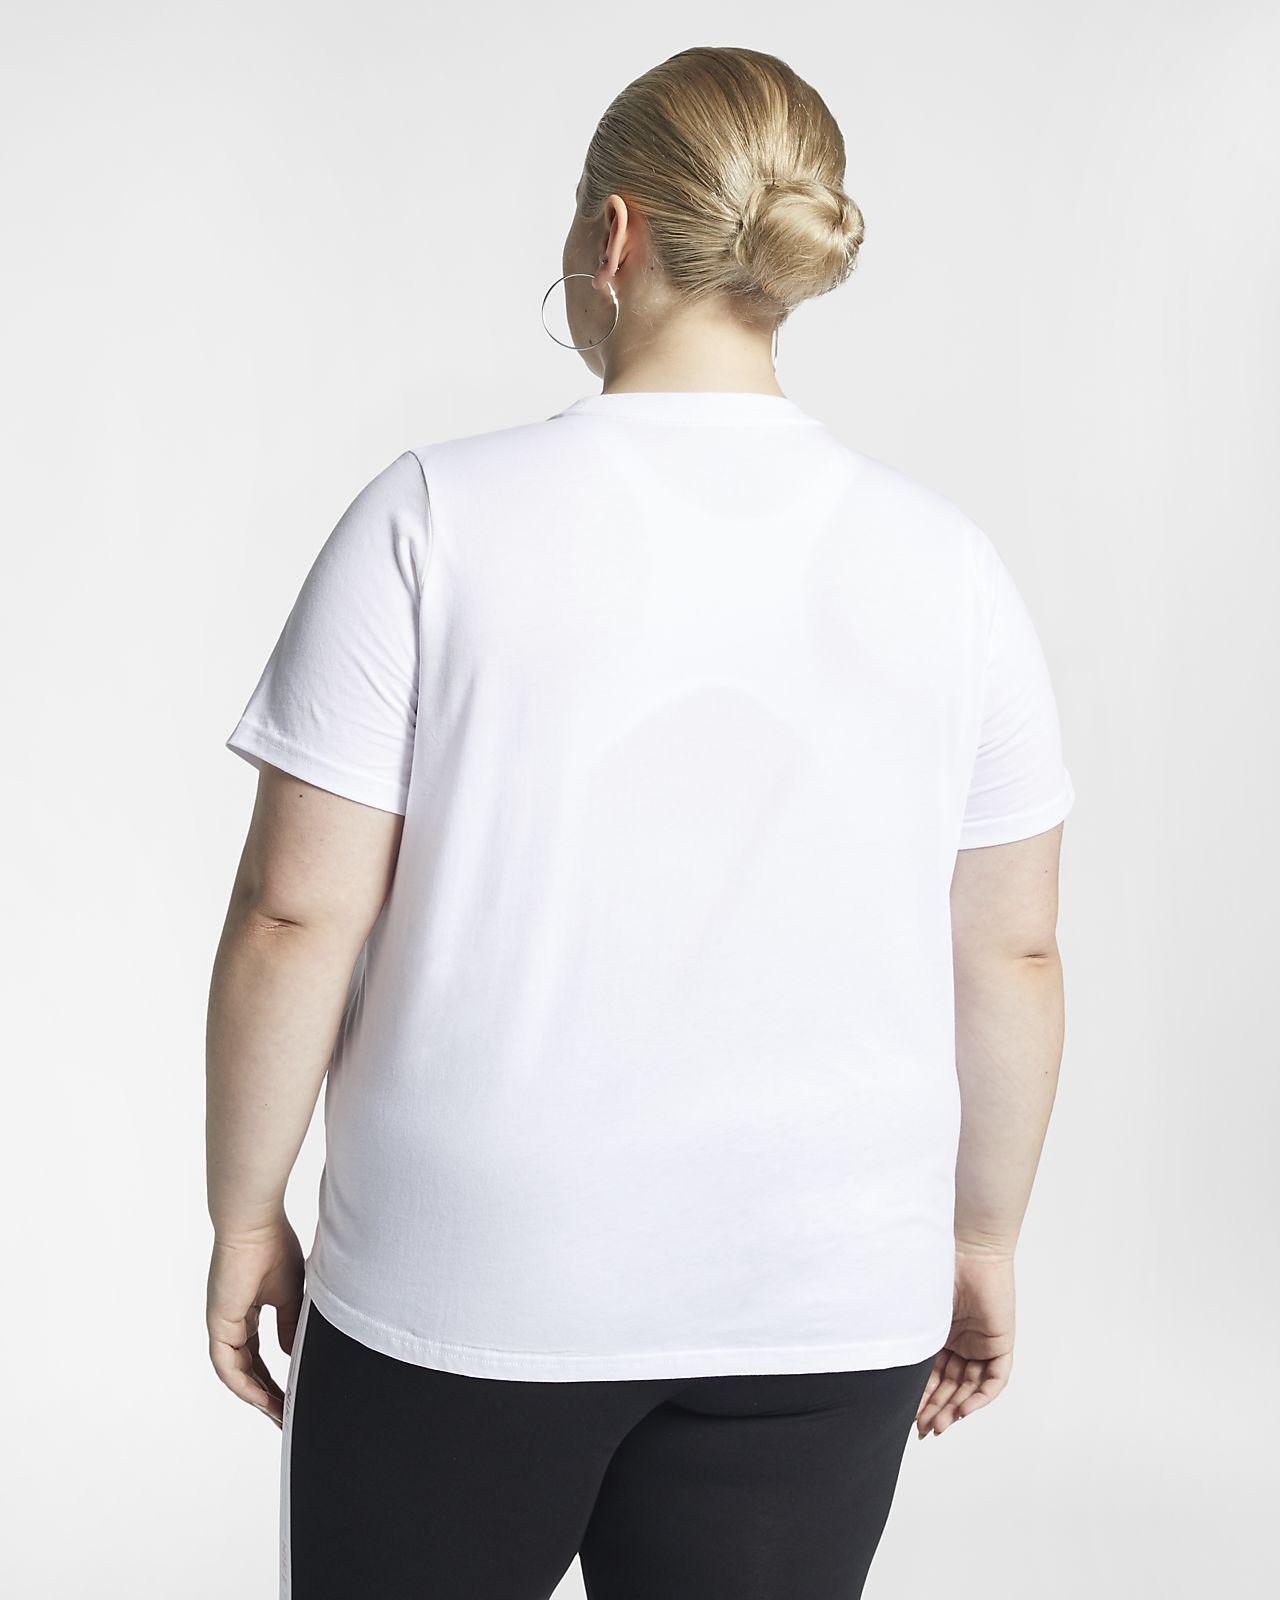 Sportswear Donnatalla Essential Camiseta Nike GrandeCh c43L5jARq